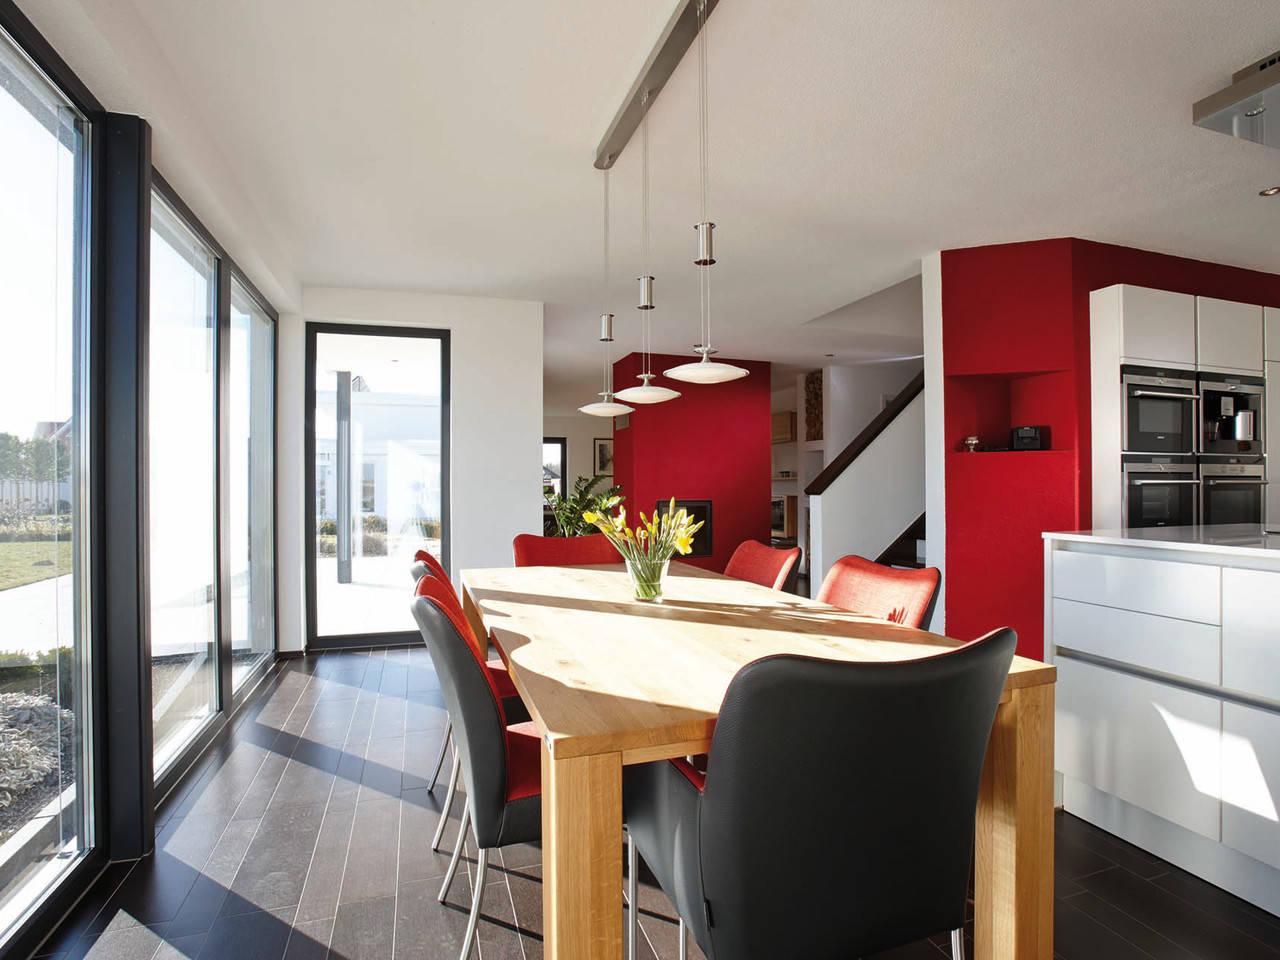 Architektur Trend Haus FingerHaus